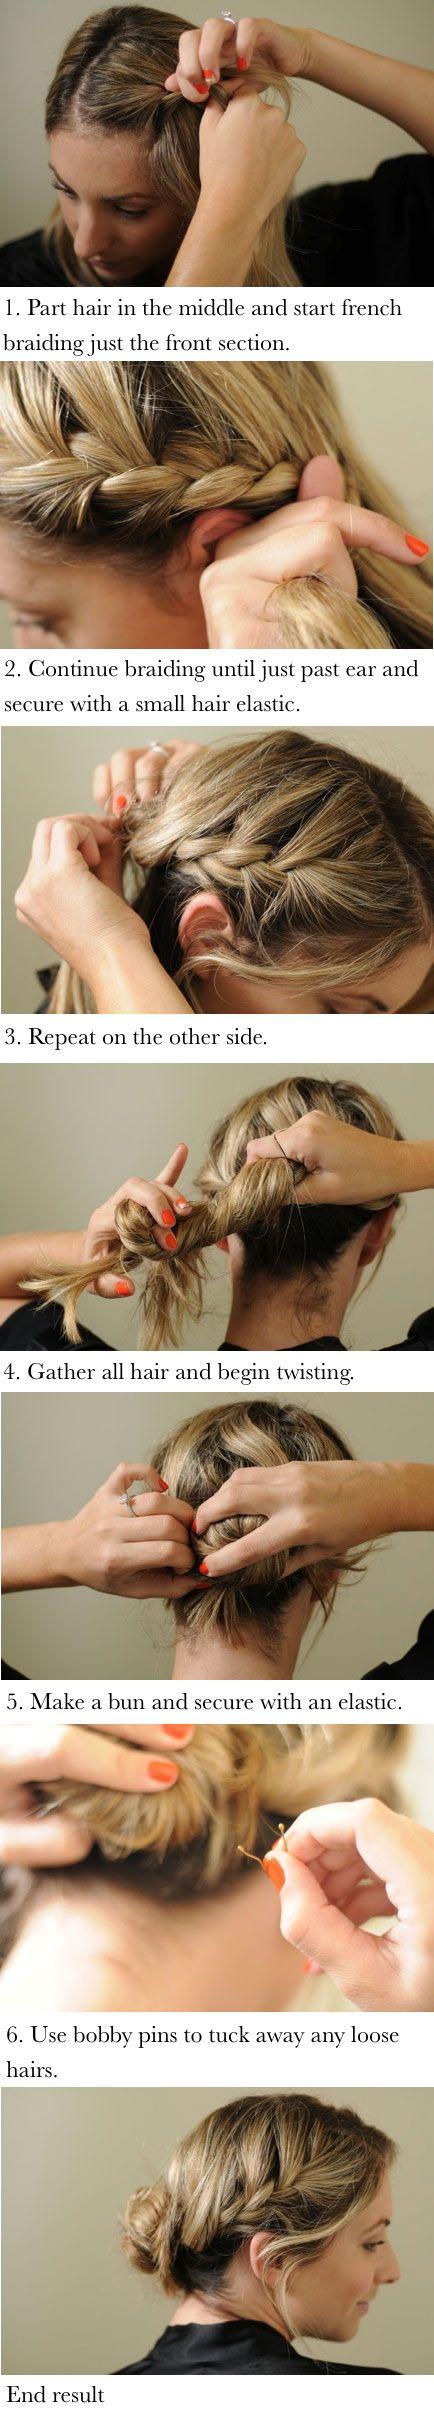 Best 25+ Under Braids Ideas On Pinterest  Braided Buns, Cute Simple  Hairstyles And Braided Hairstyles Tutorials